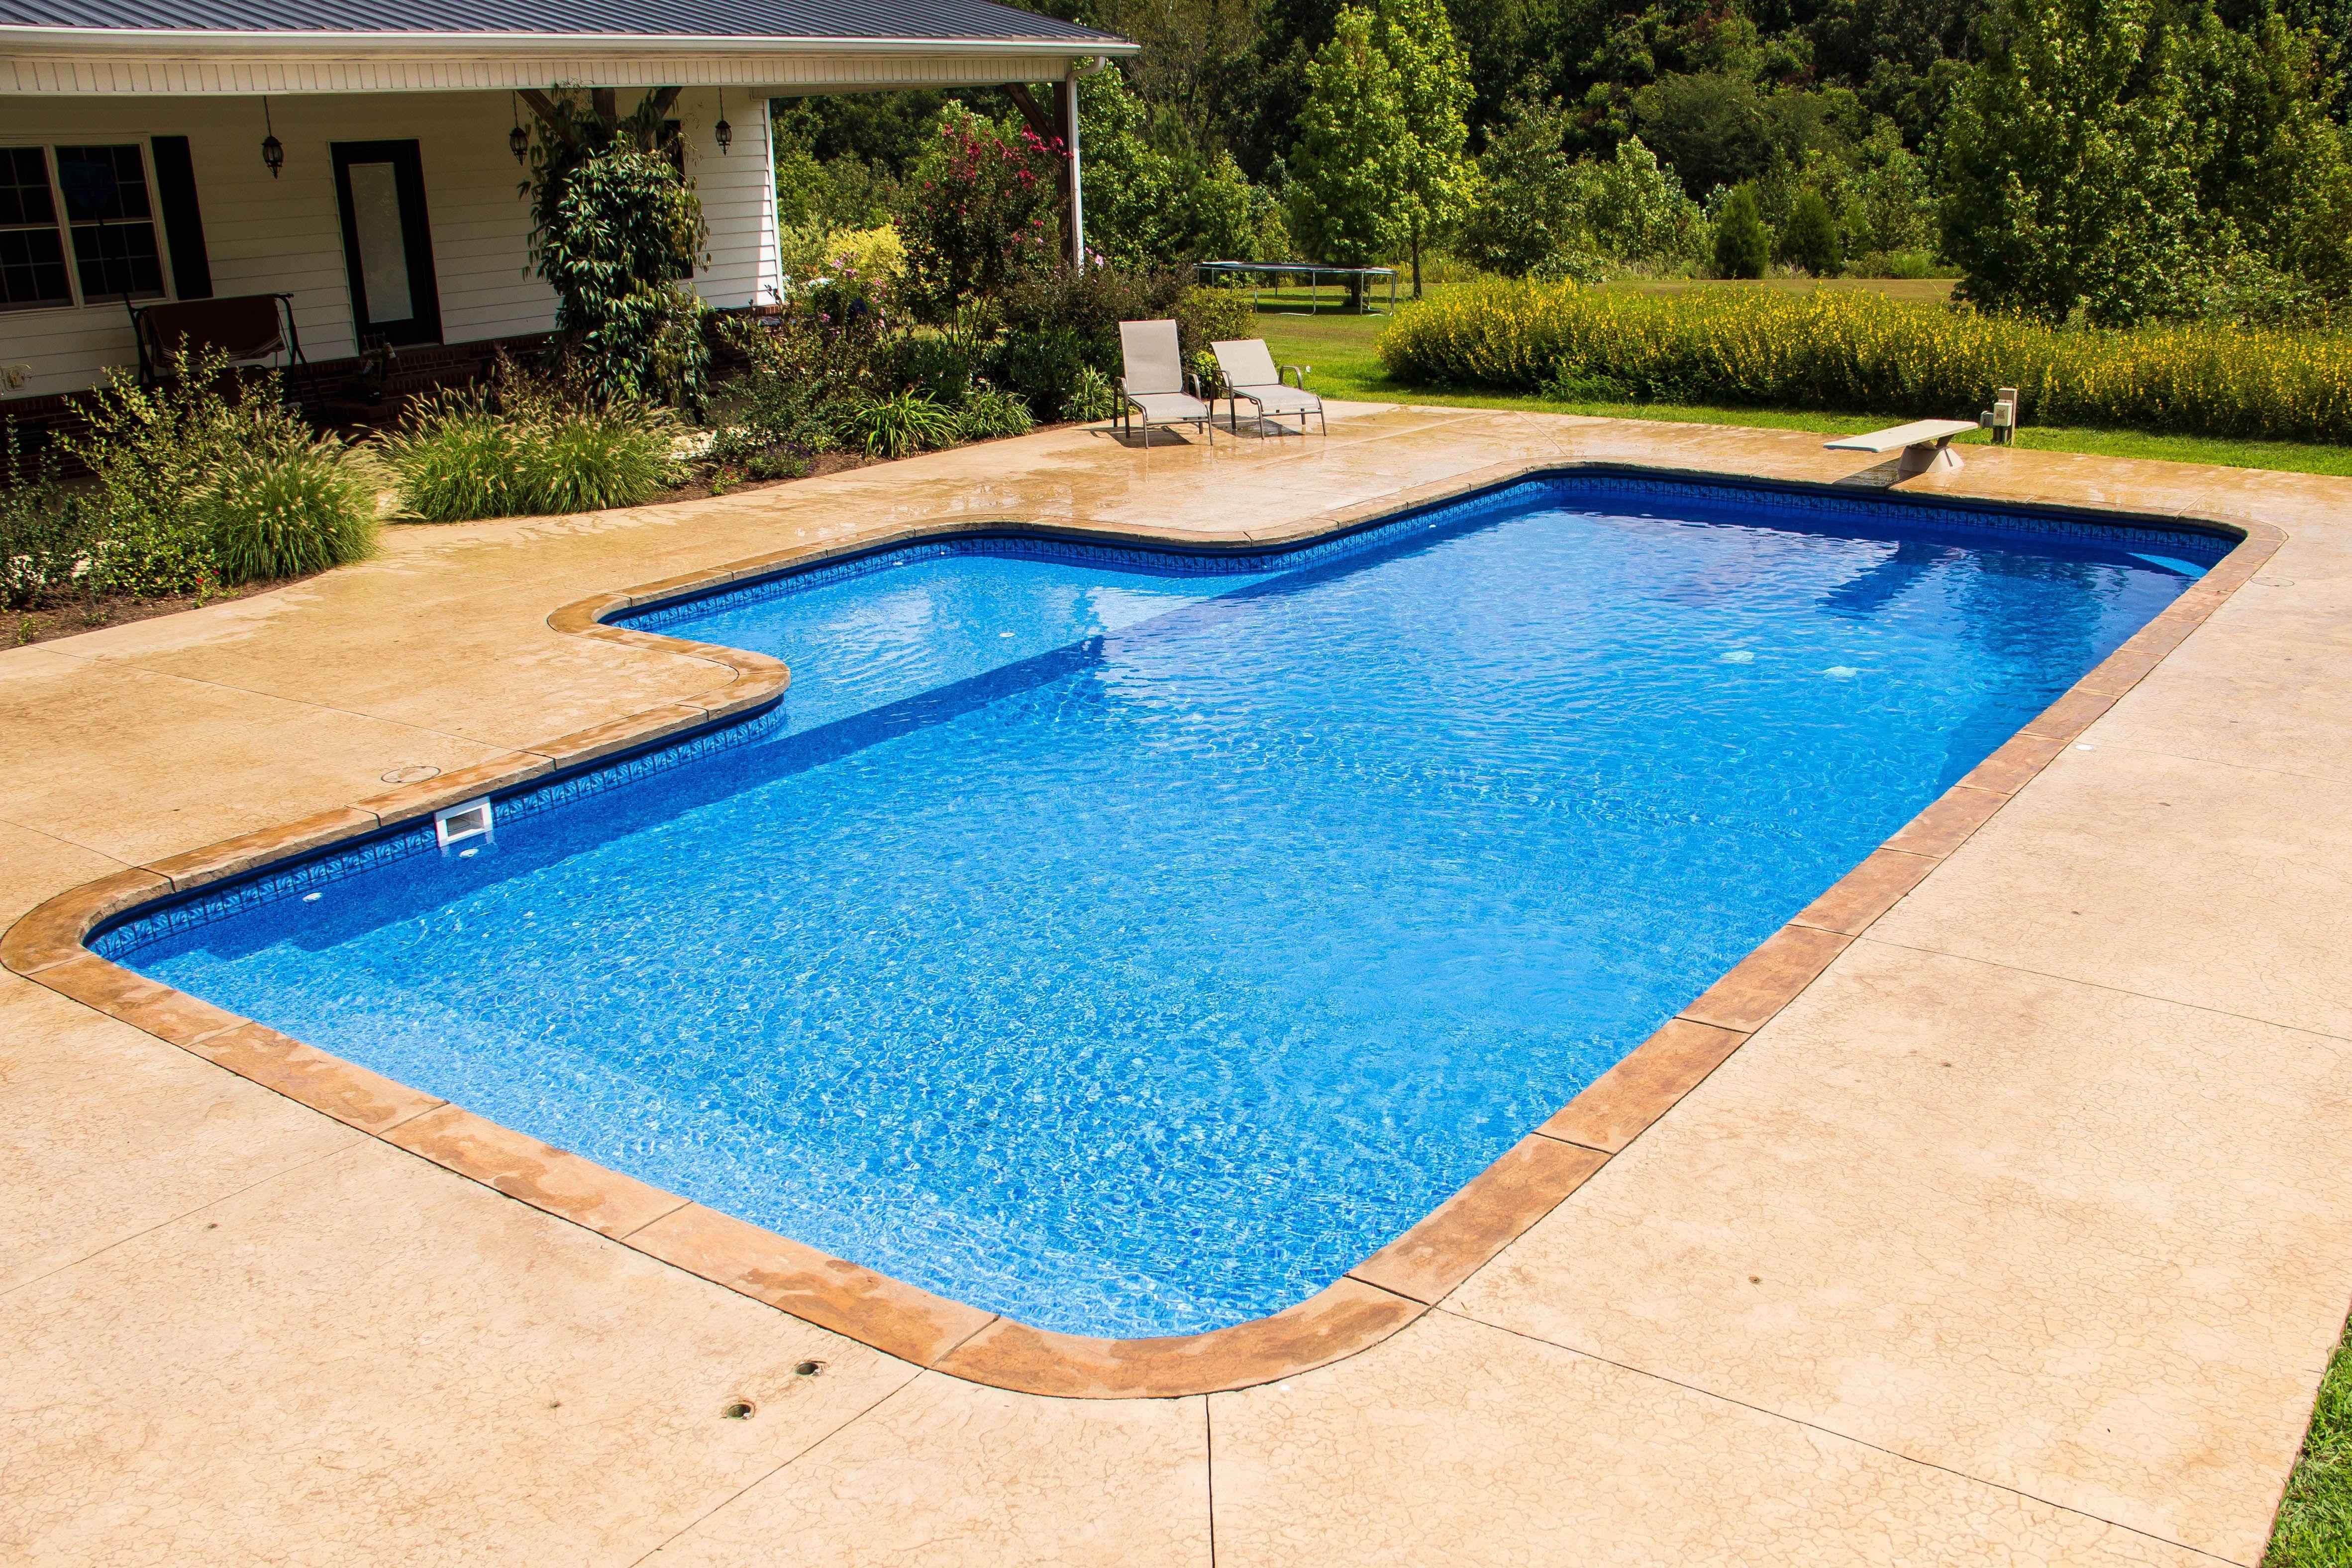 Aloha Pools And Spas Of Jackson Llc 614 Carriage House Dr Jackson Tn 38305 Tel 73 Pools Backyard Inground Backyard Pool Landscaping Swimming Pools Backyard